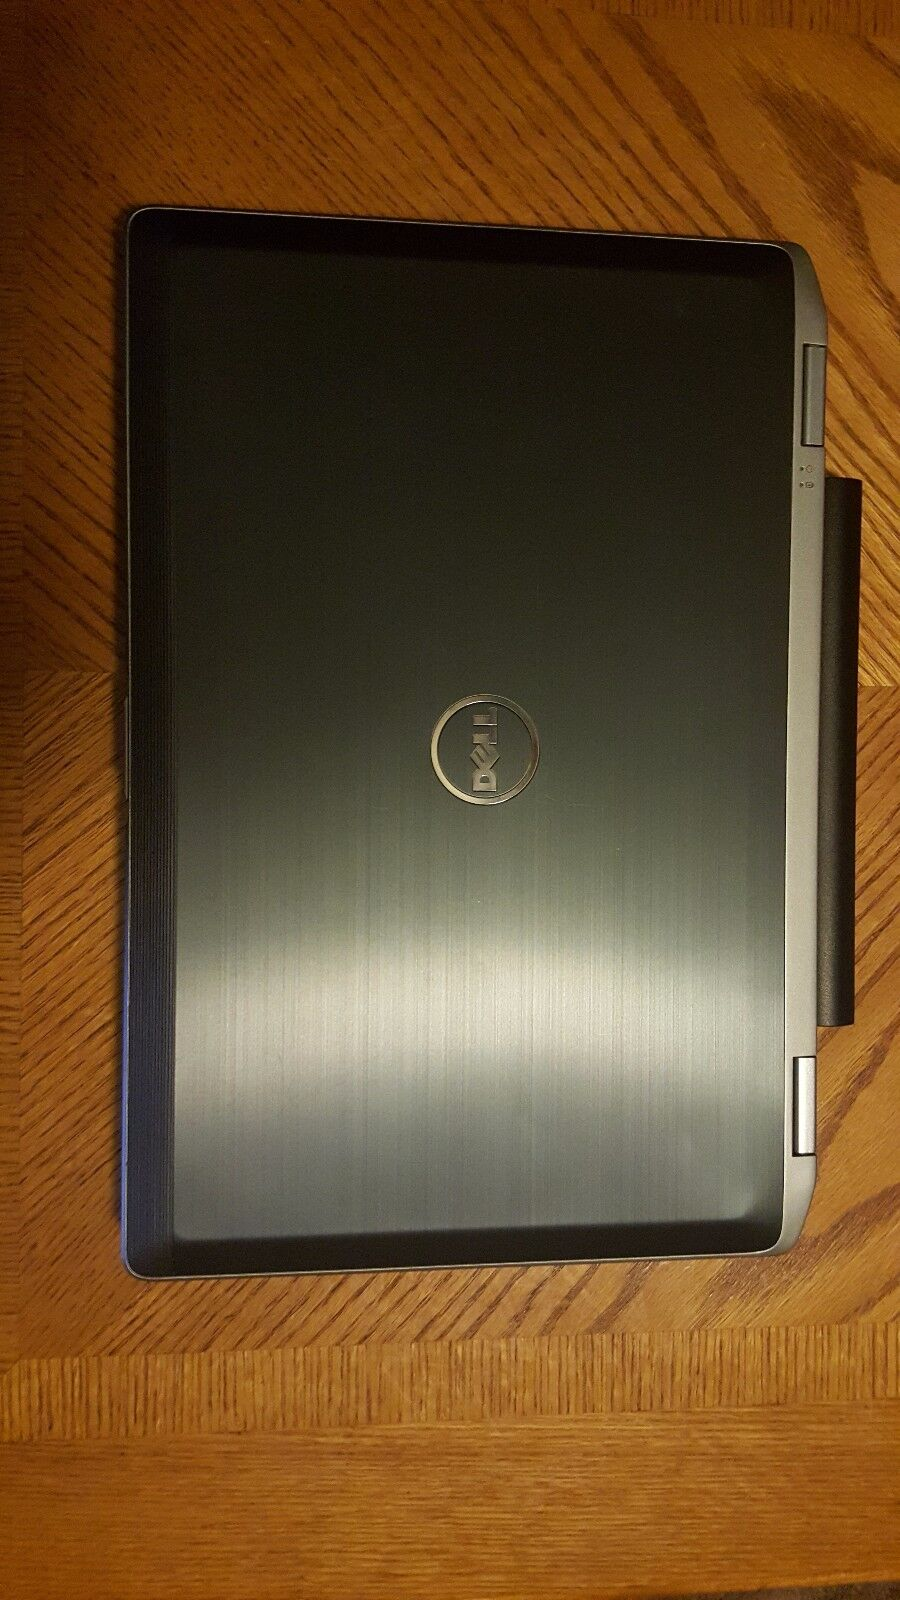 "DELL E6520-15.6in -i3 HDD 320/500gig 8GIG RAM '''''''SALE"""""""""""""